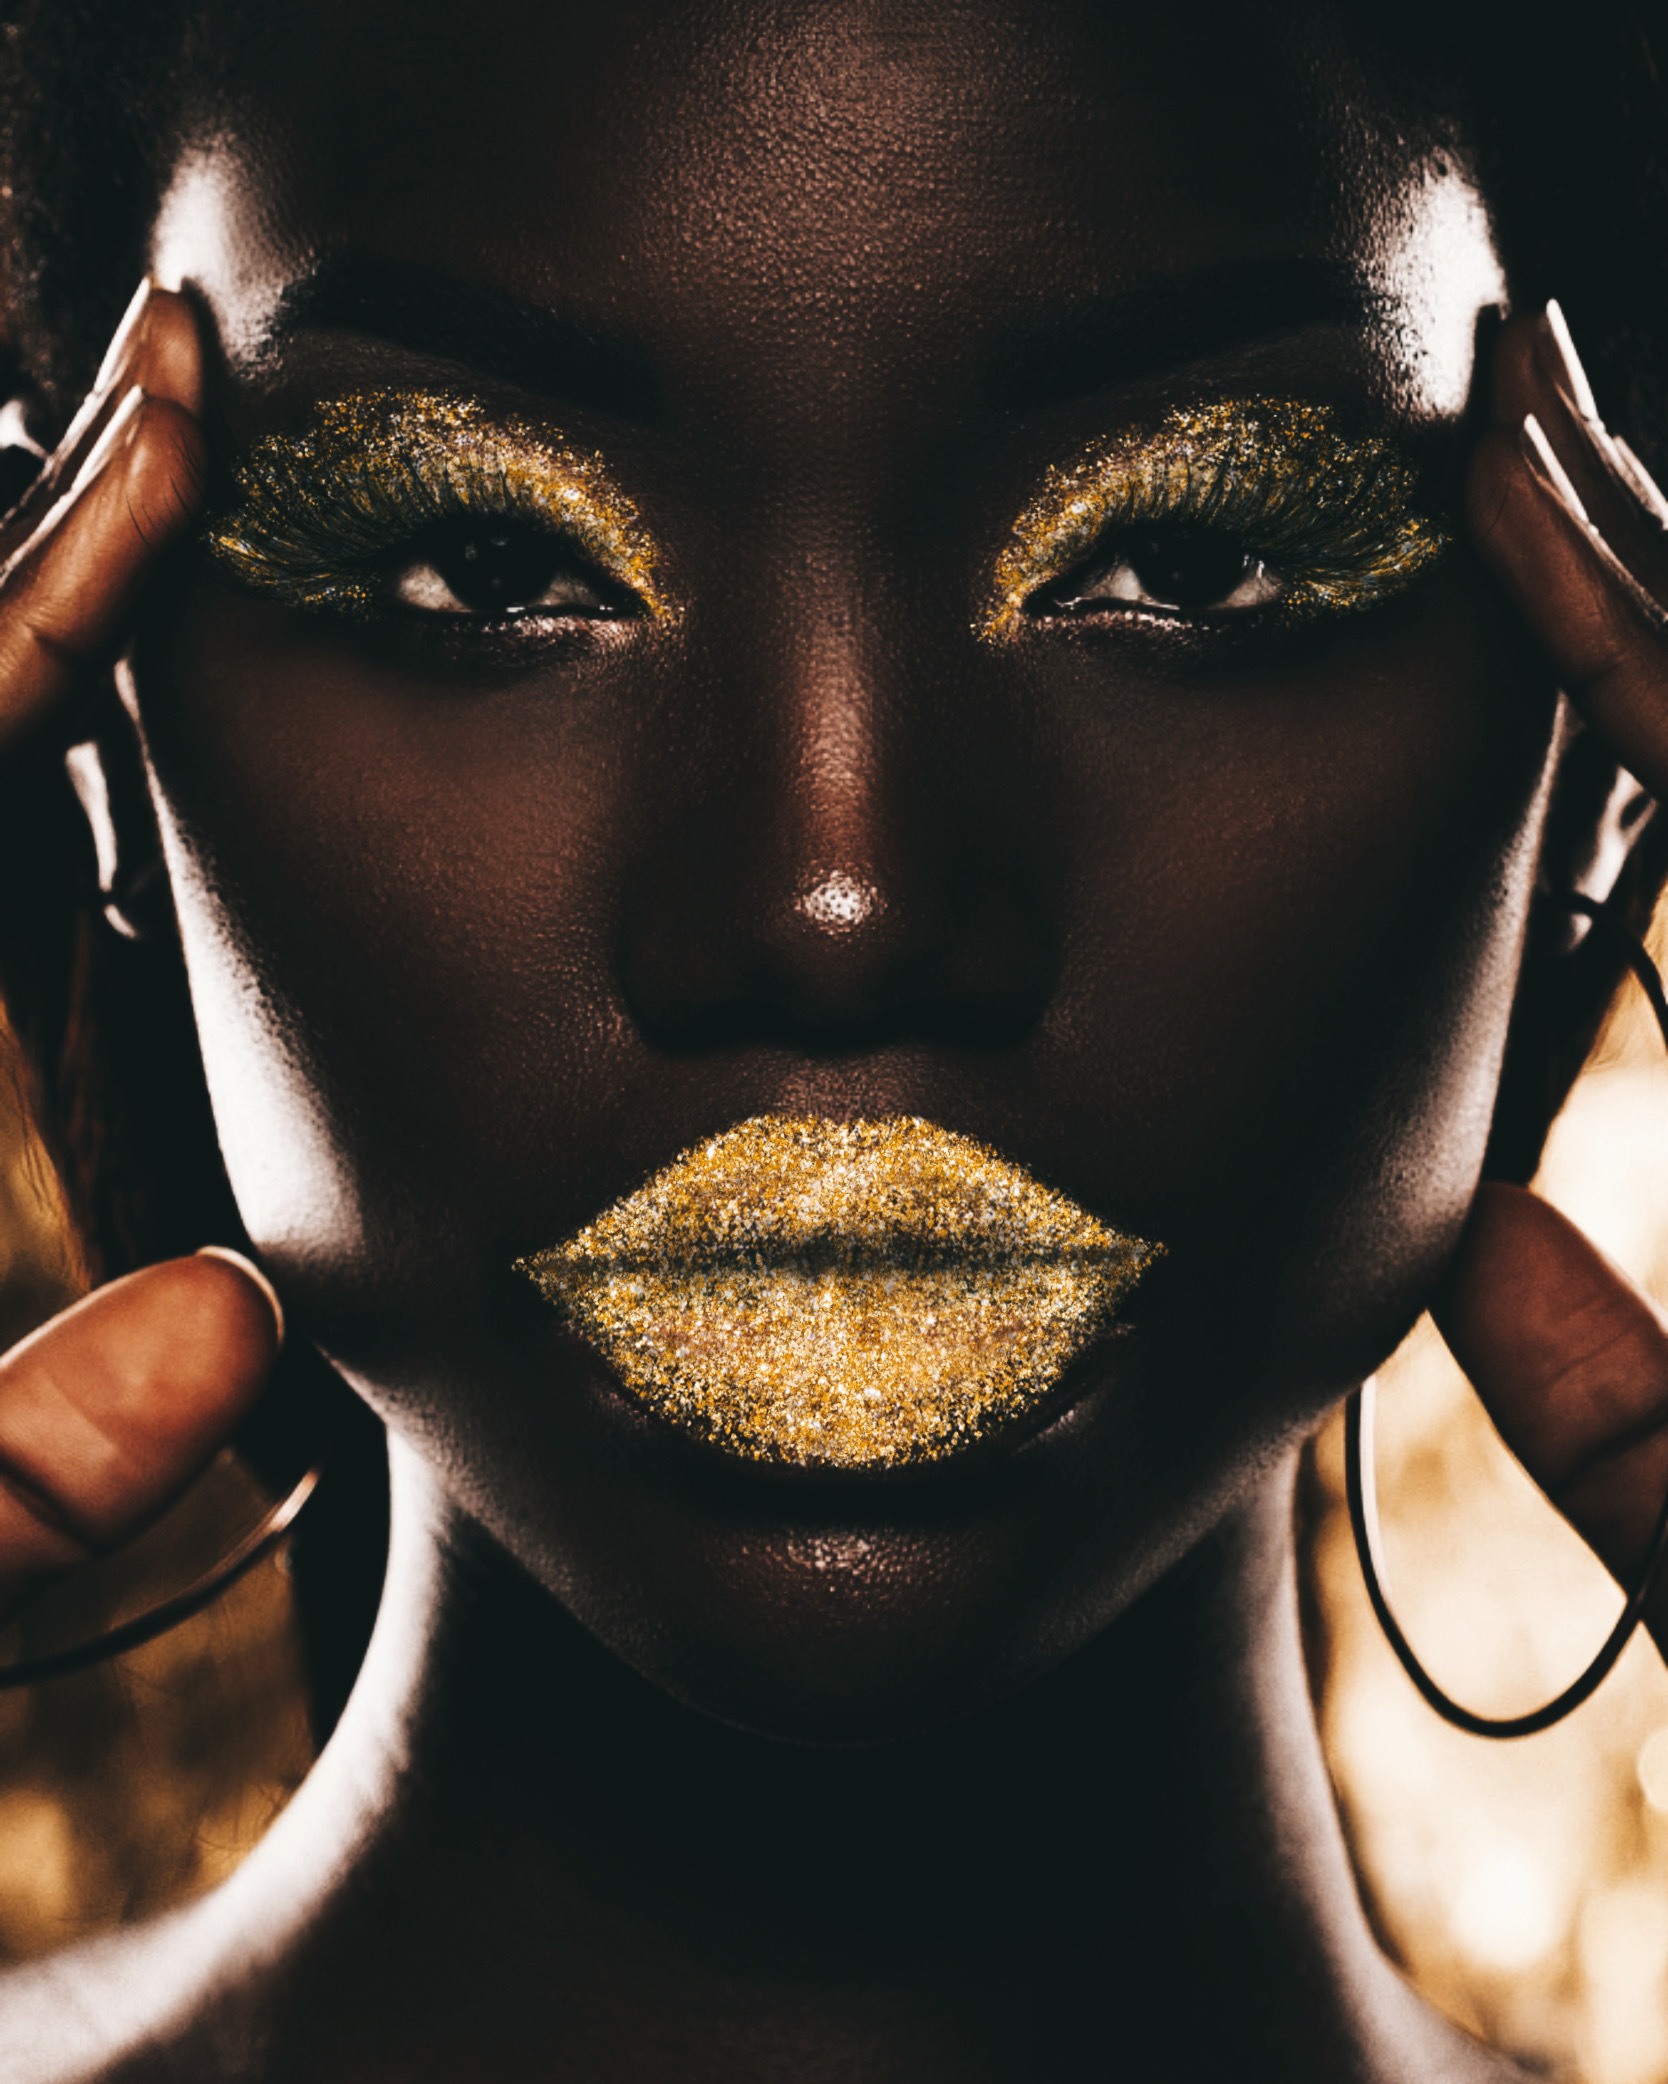 Inspired by PicsArt creator Namafu ✨ #glitter #glittermakeup #gold #goldglitter #freetoedit